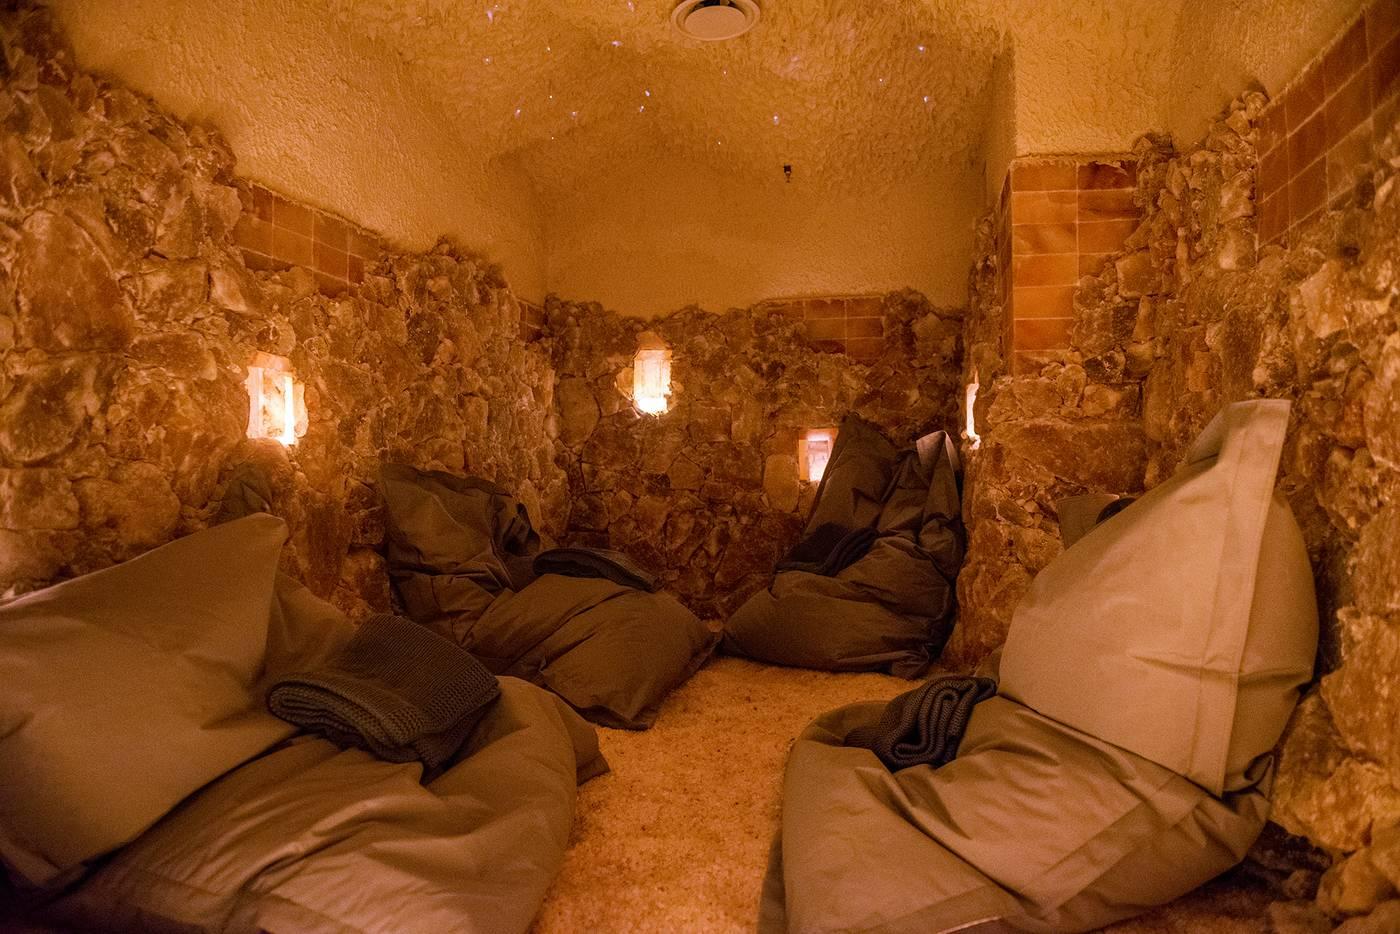 Hoame Toronto Edit Seven meditation salt cave